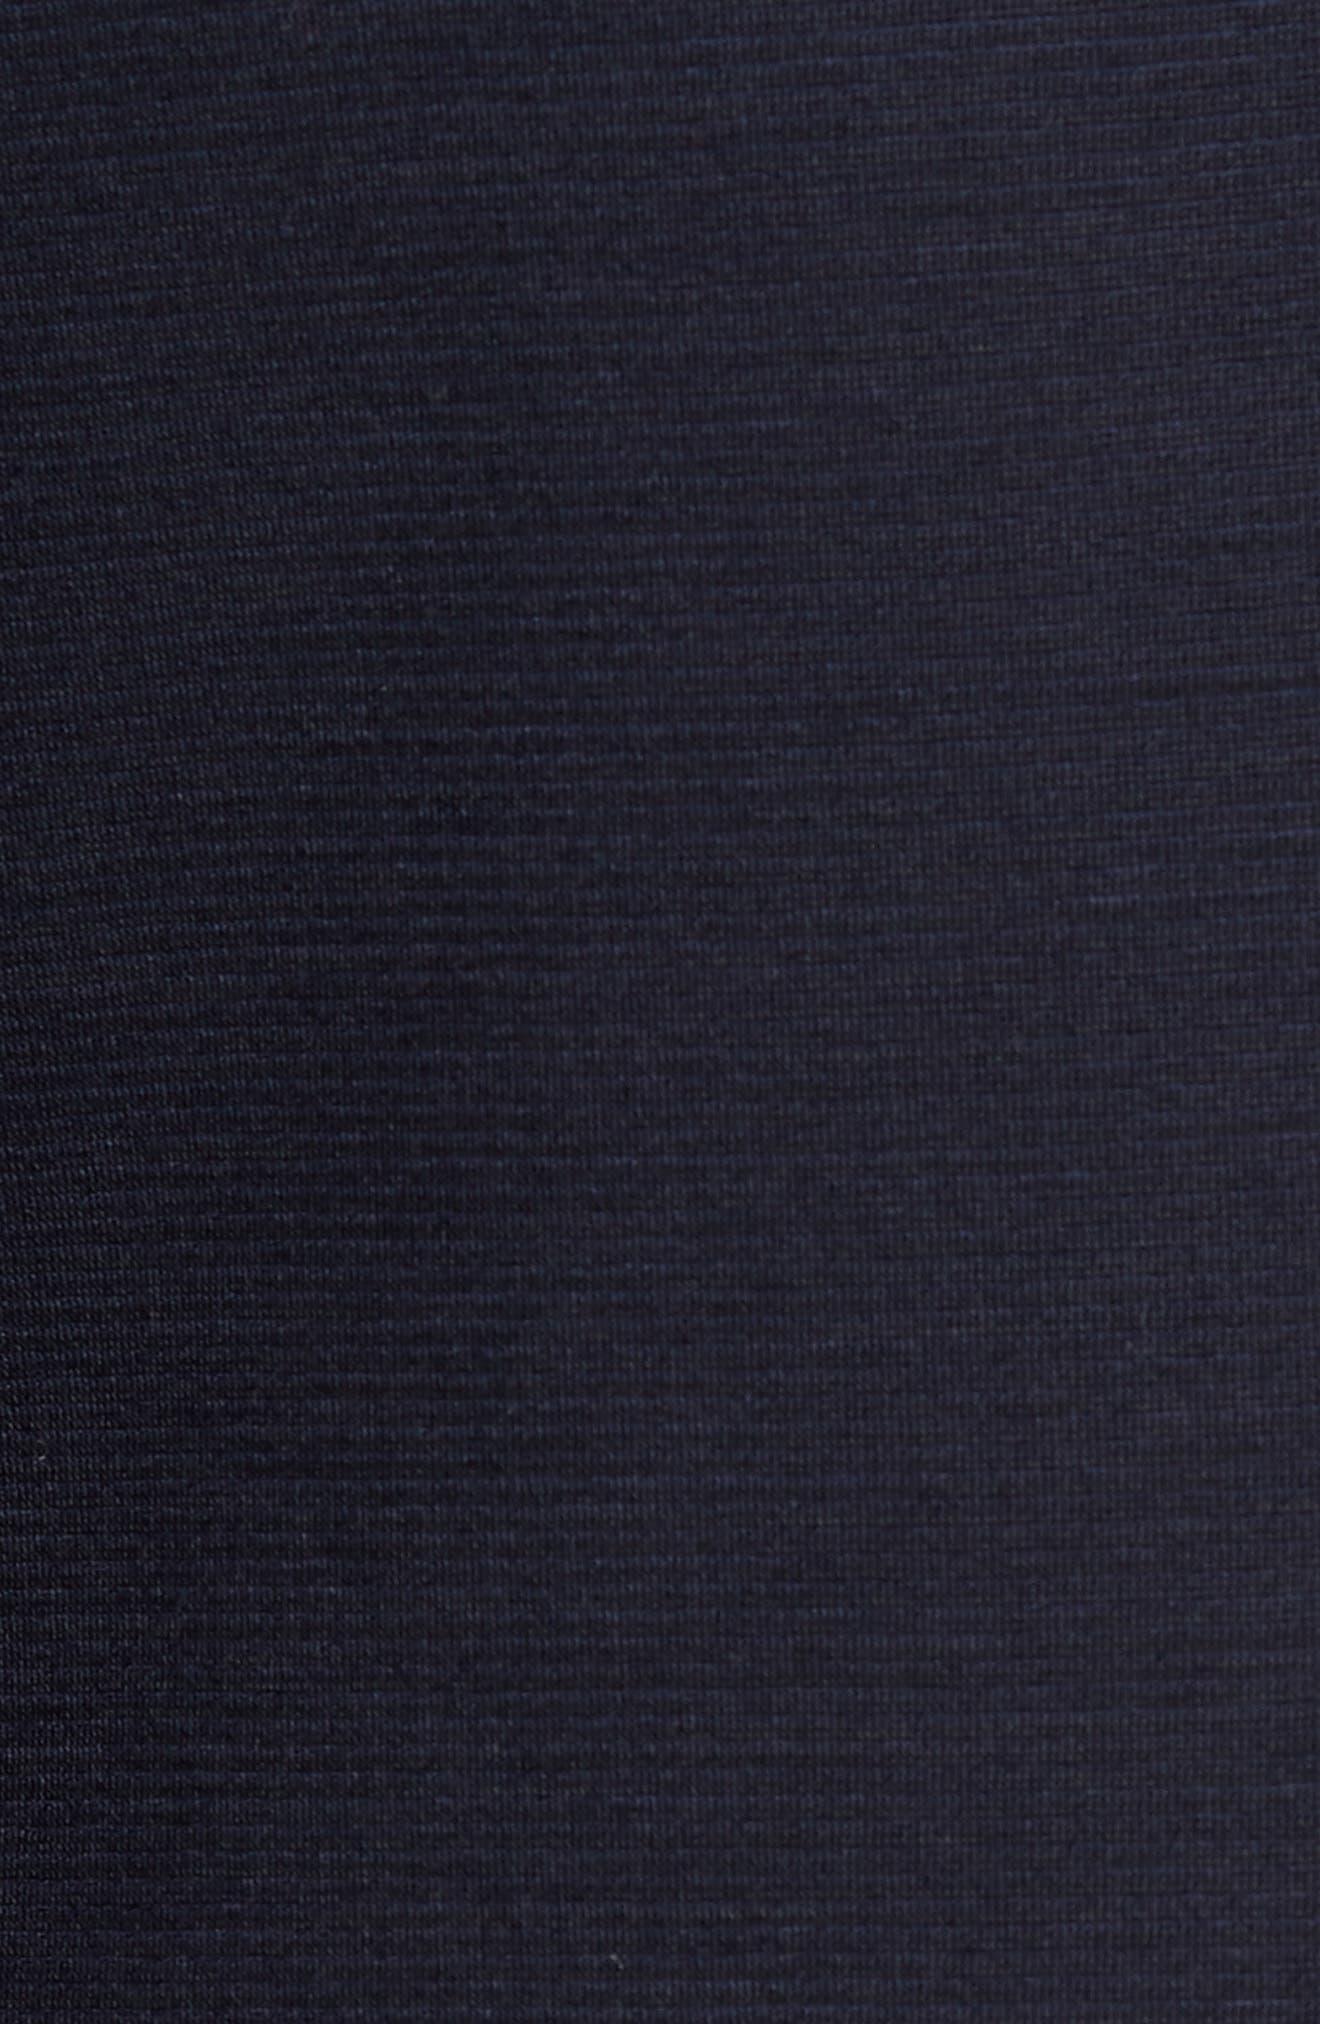 Cardrona Slim Fit Wool Blend Blazer,                             Alternate thumbnail 6, color,                             460